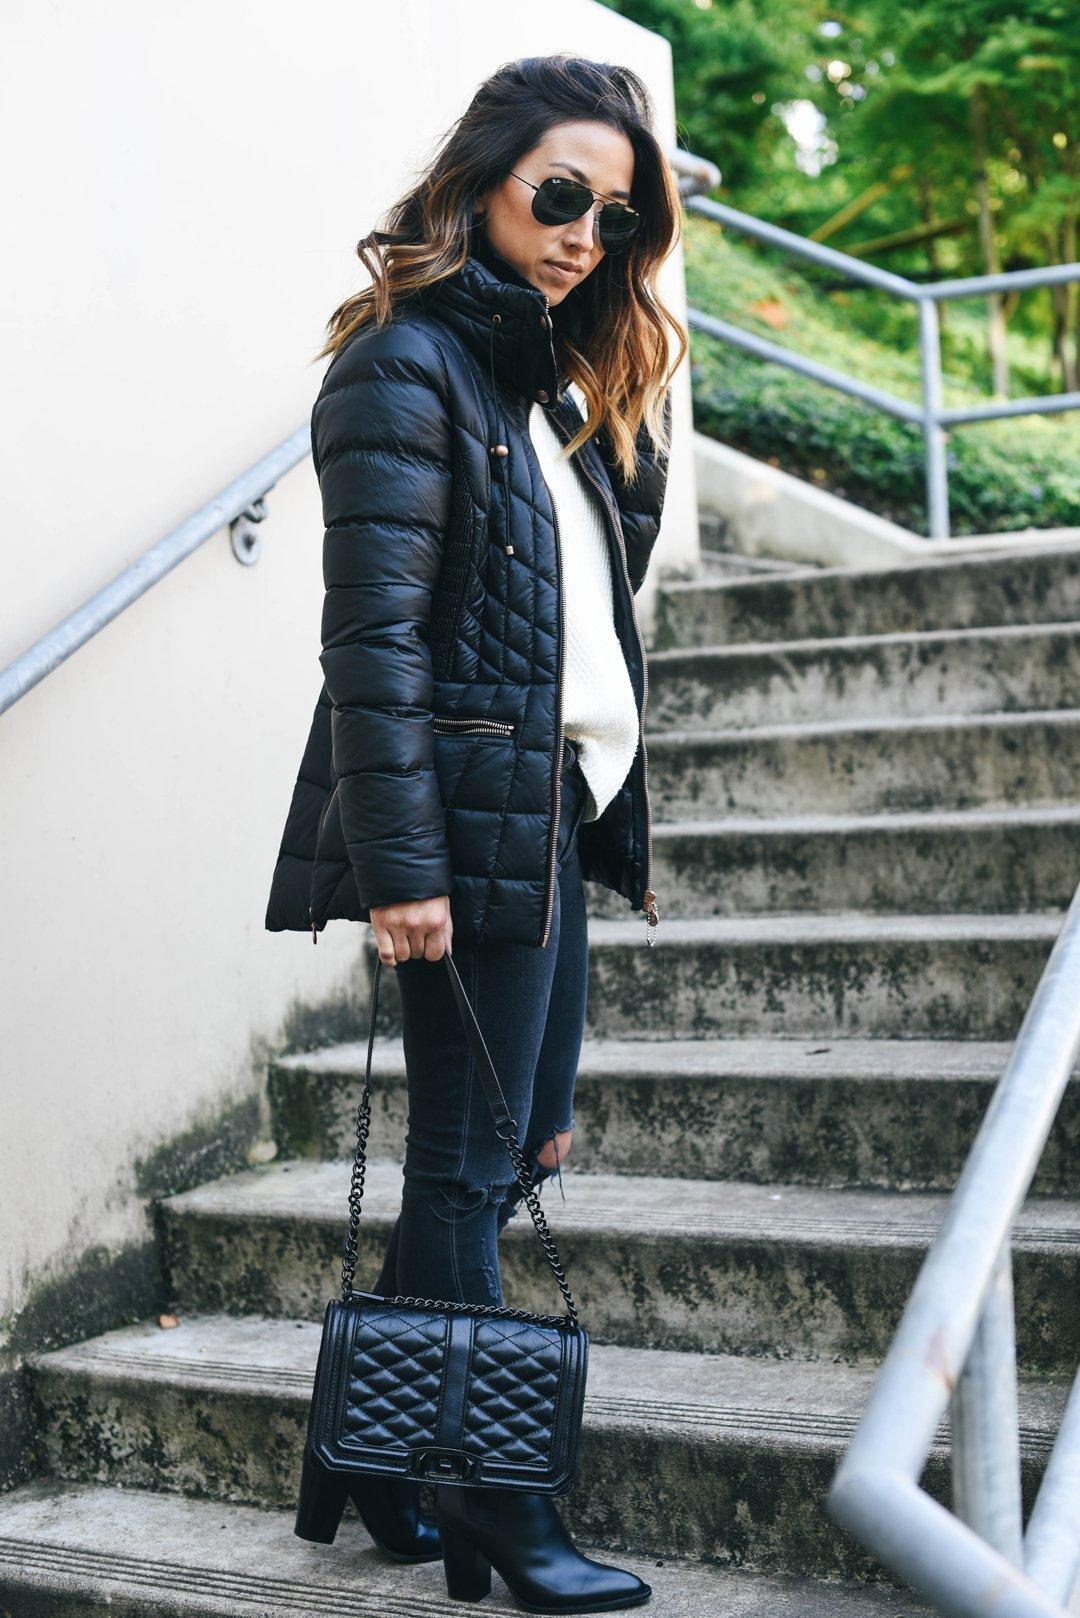 crystalin-marie-wearing-rebecca-minkoff-love-bag